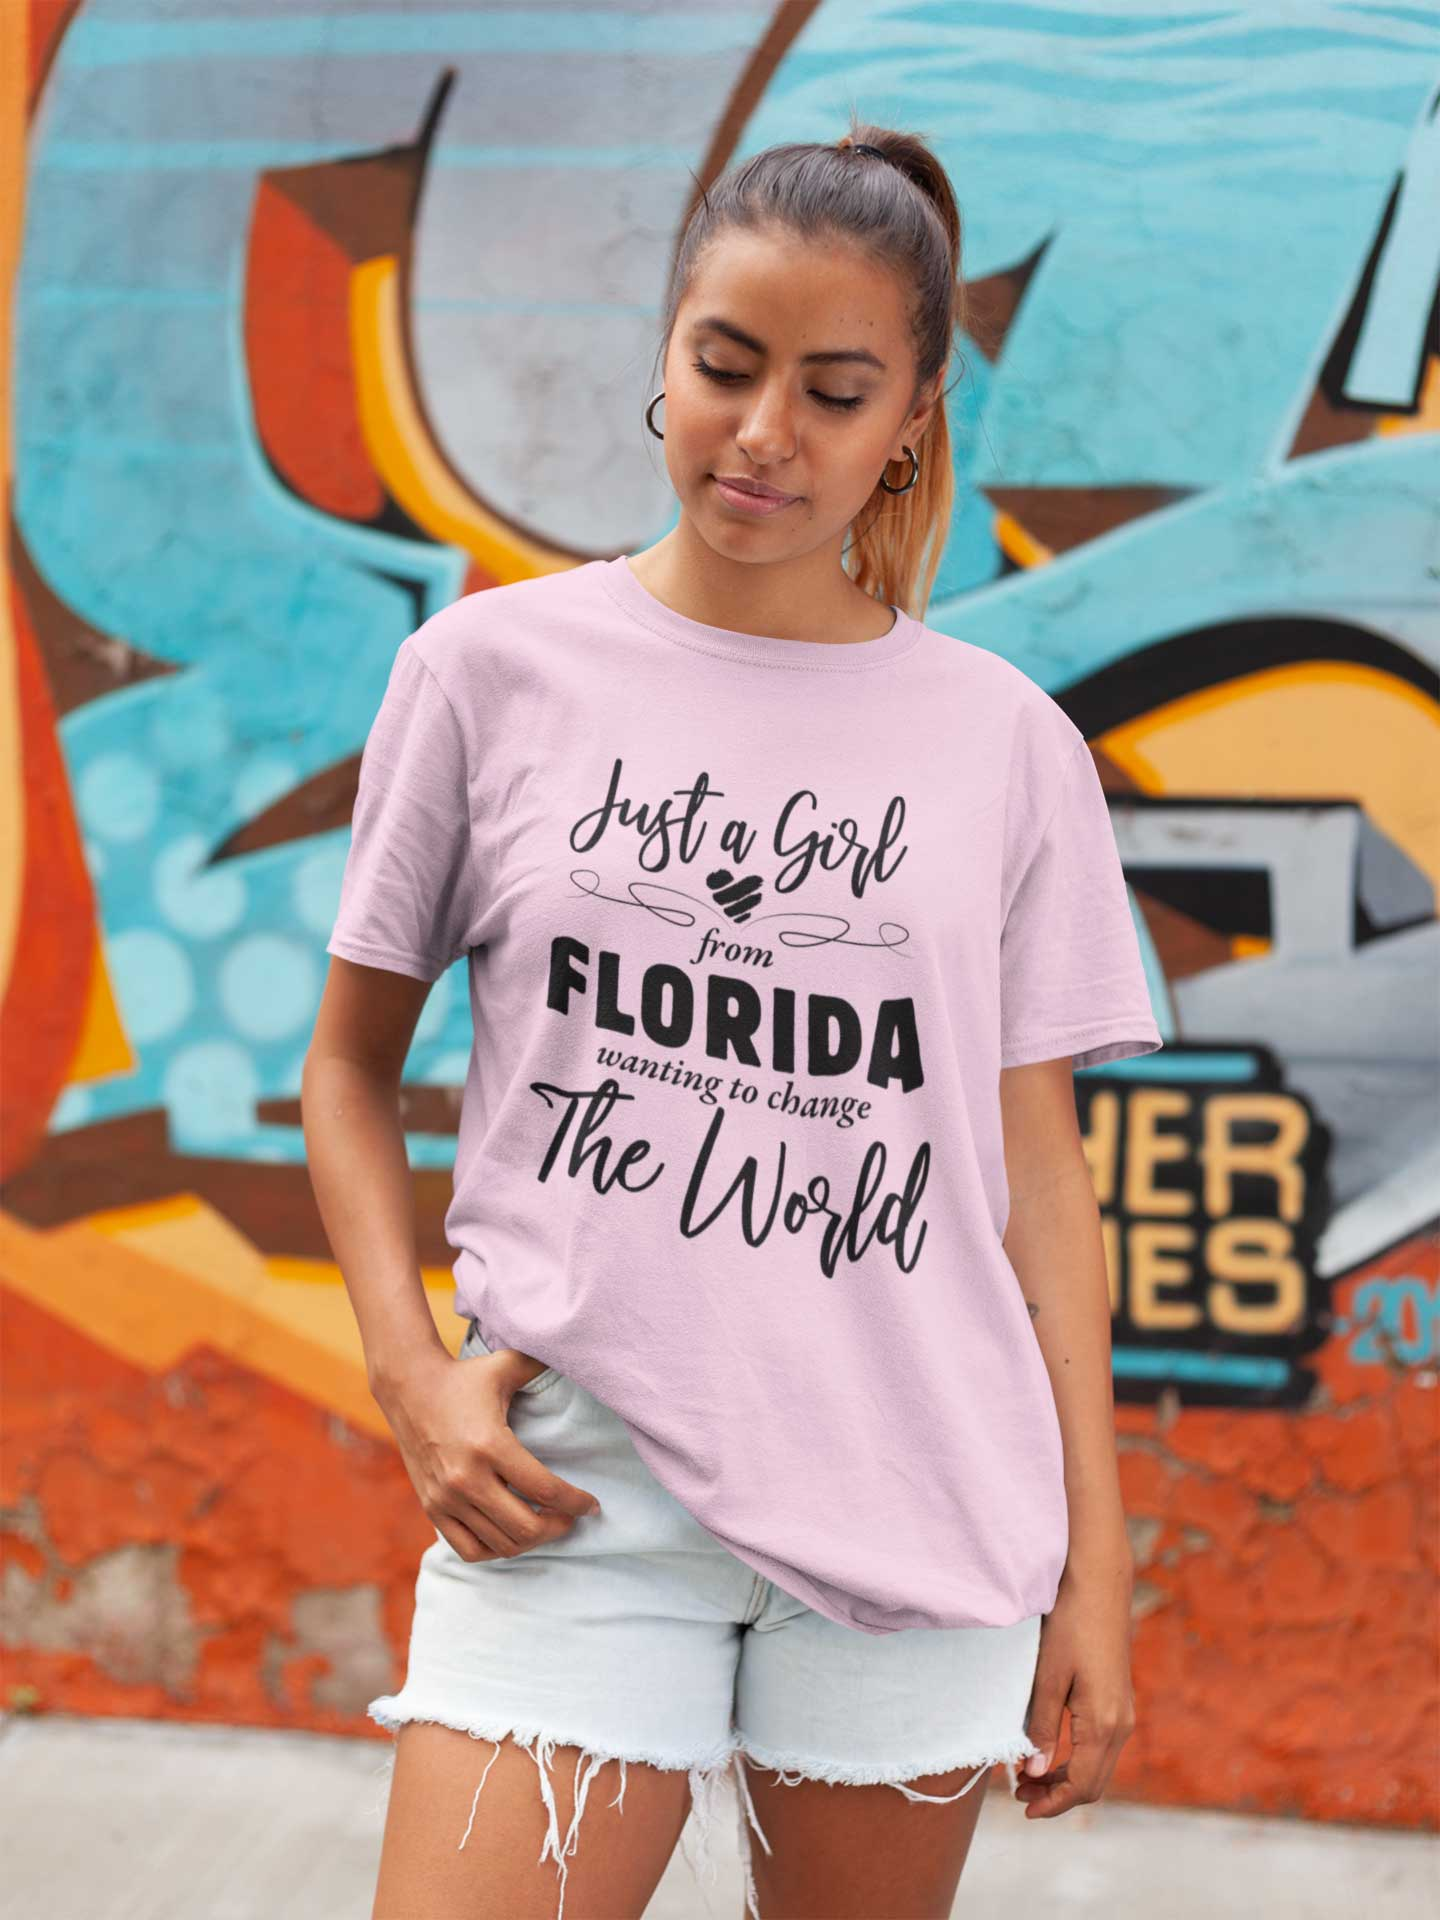 Love Missions T-Shirt Designer Florida